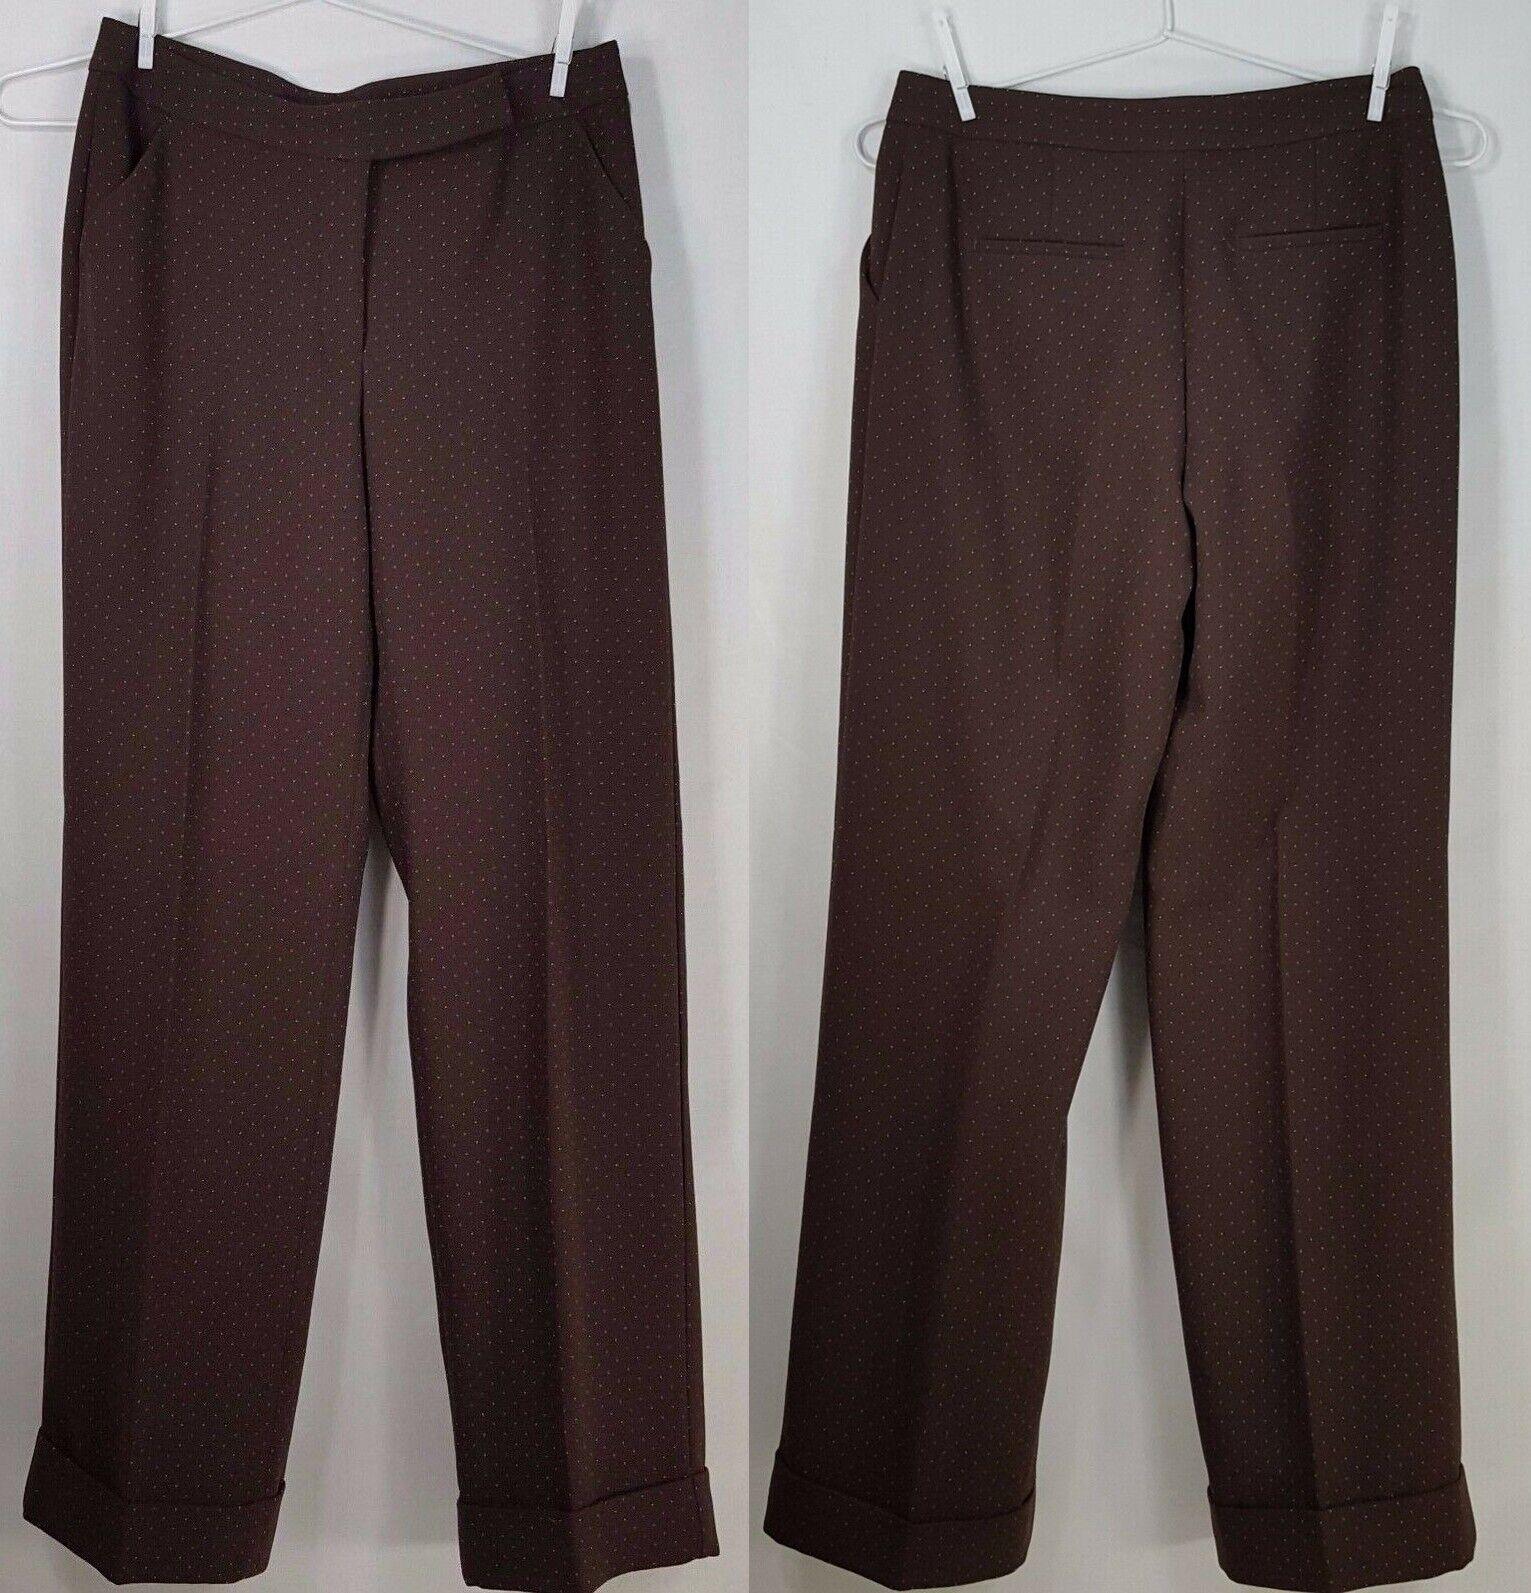 NOS Vtg Moda international Wide Leg Pants Größe 8 braun Pin Polka Dot Cuffed